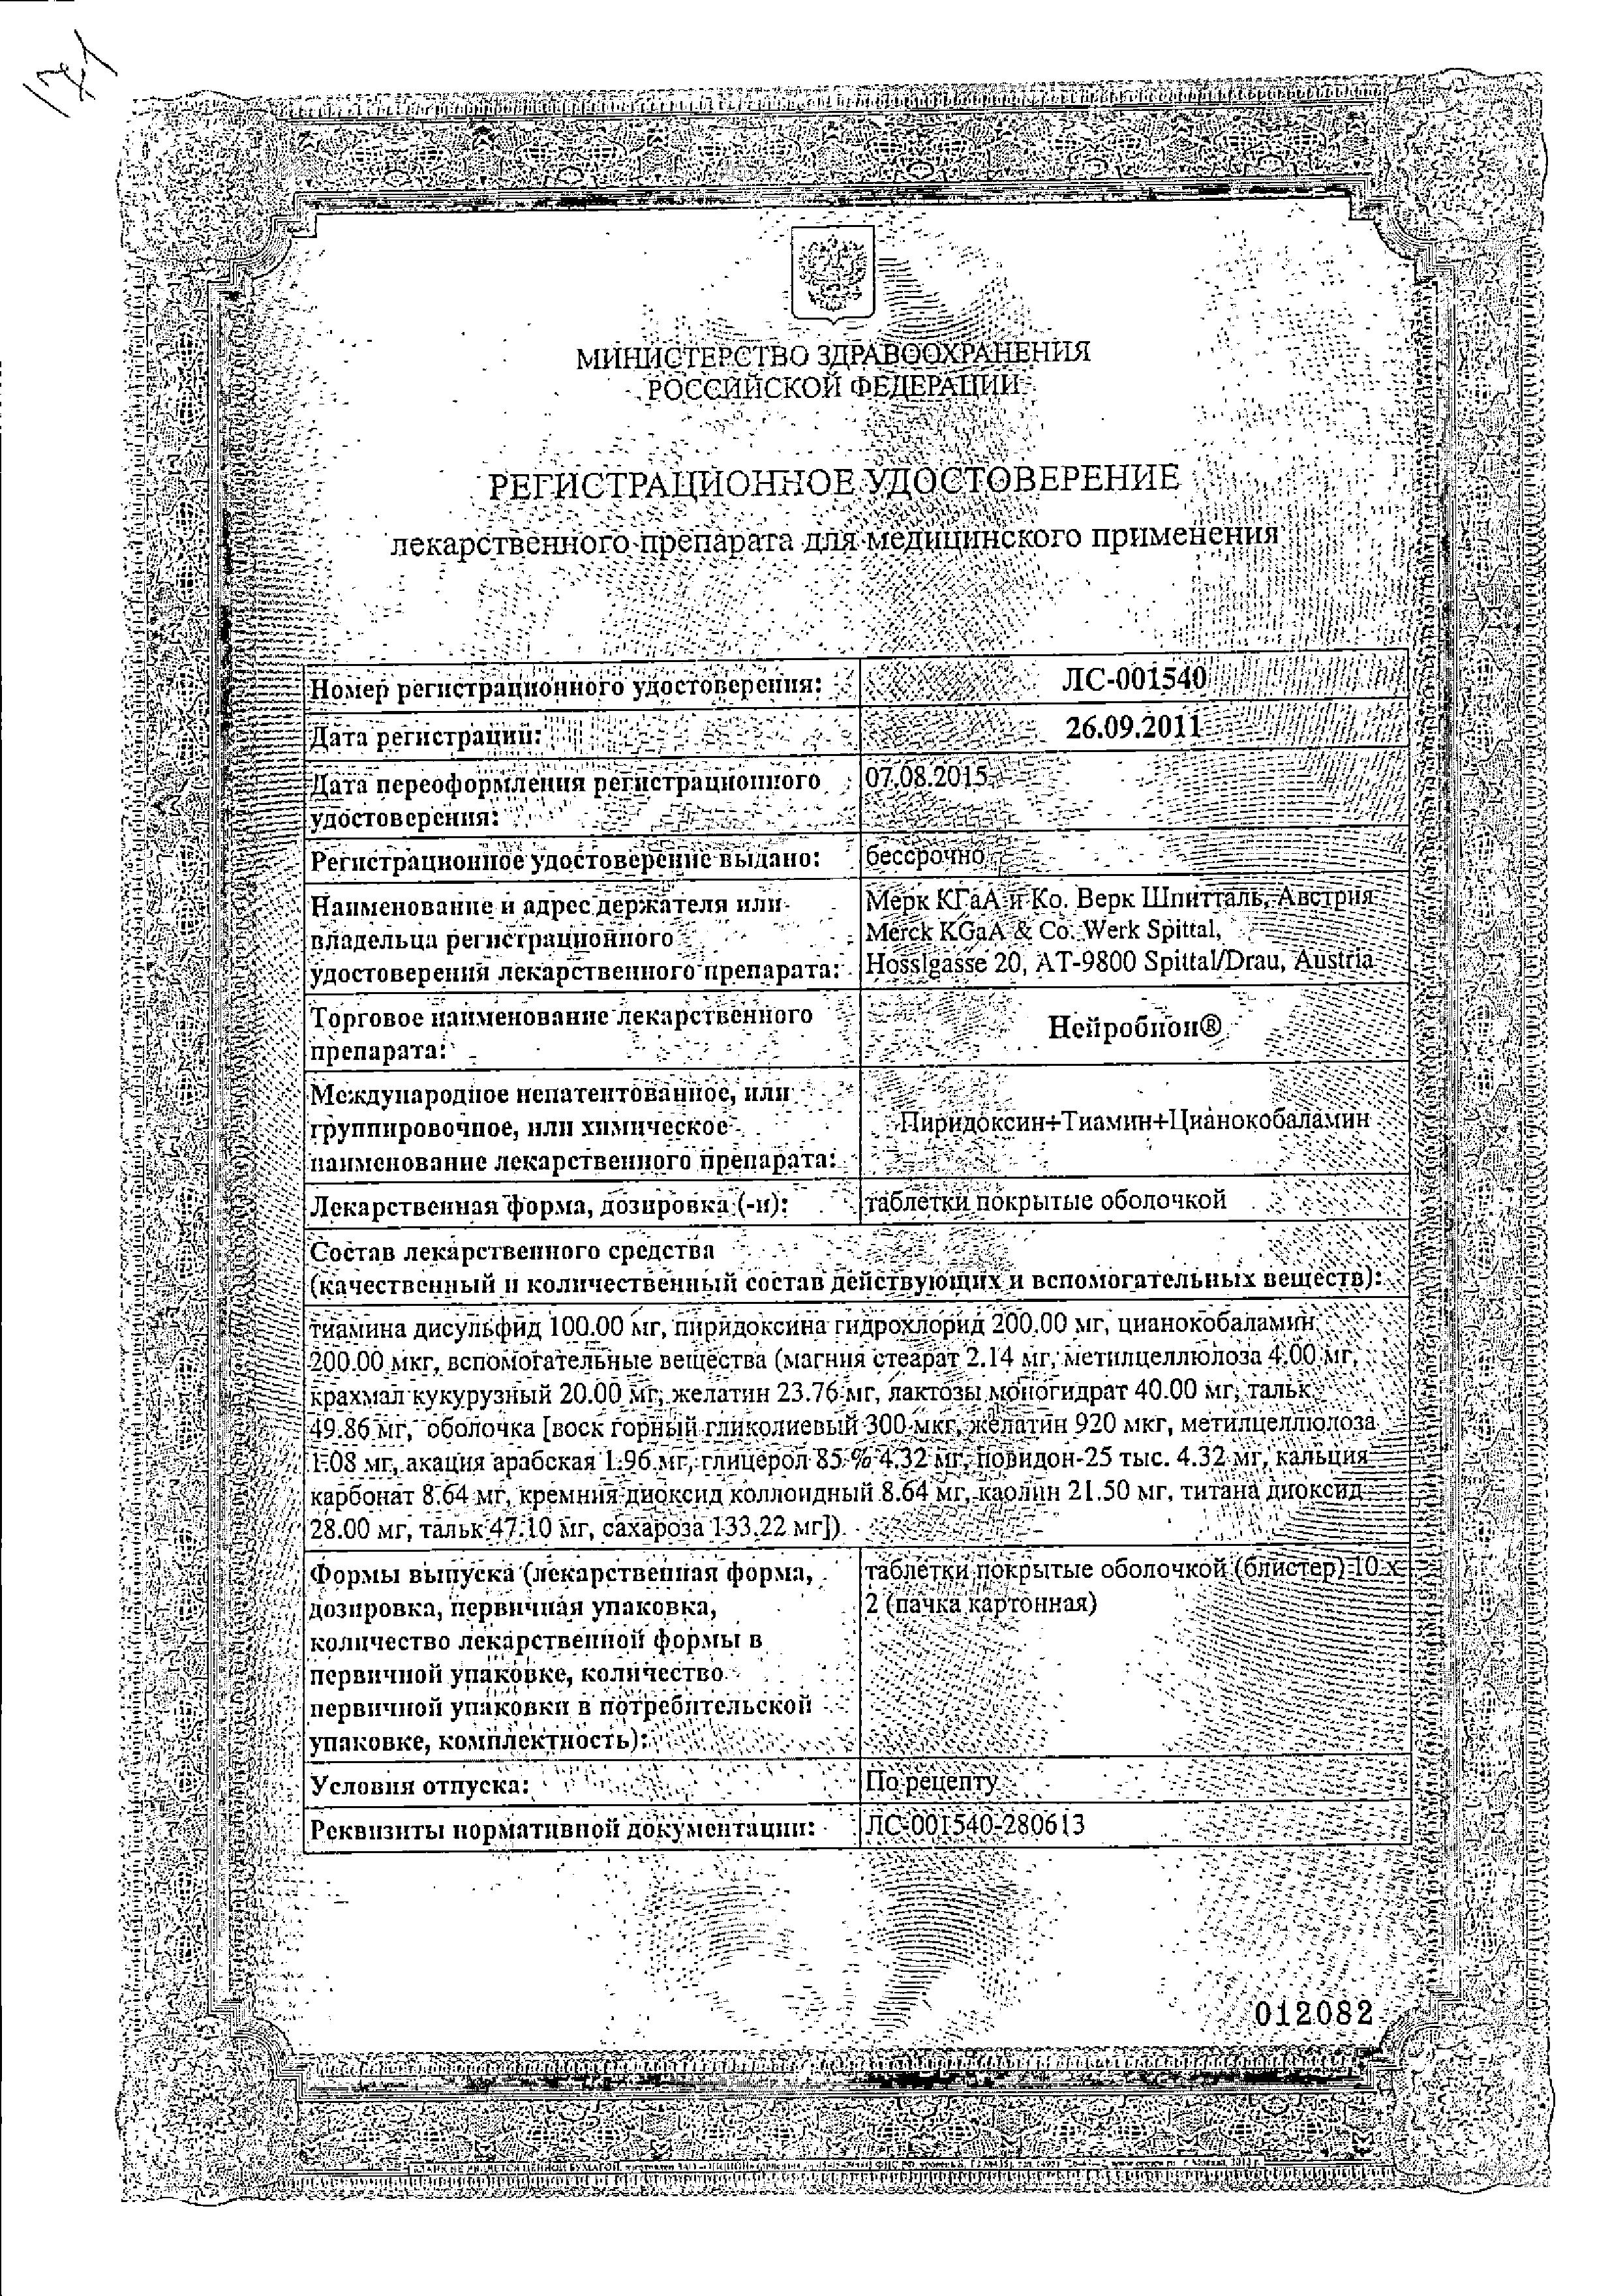 Нейробион сертификат